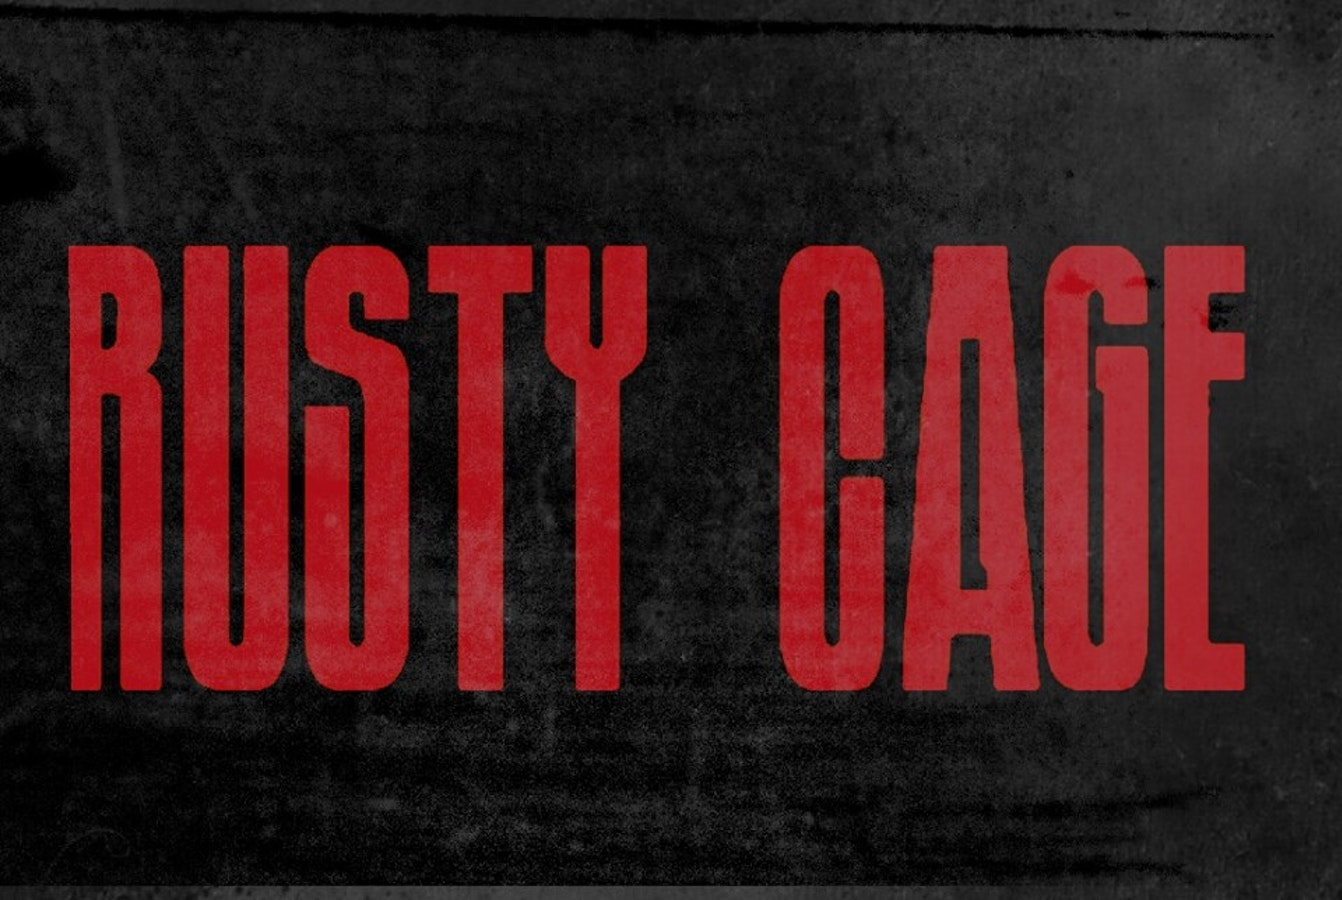 Rusty Cage: 90s Grunge and Alternative Club Night